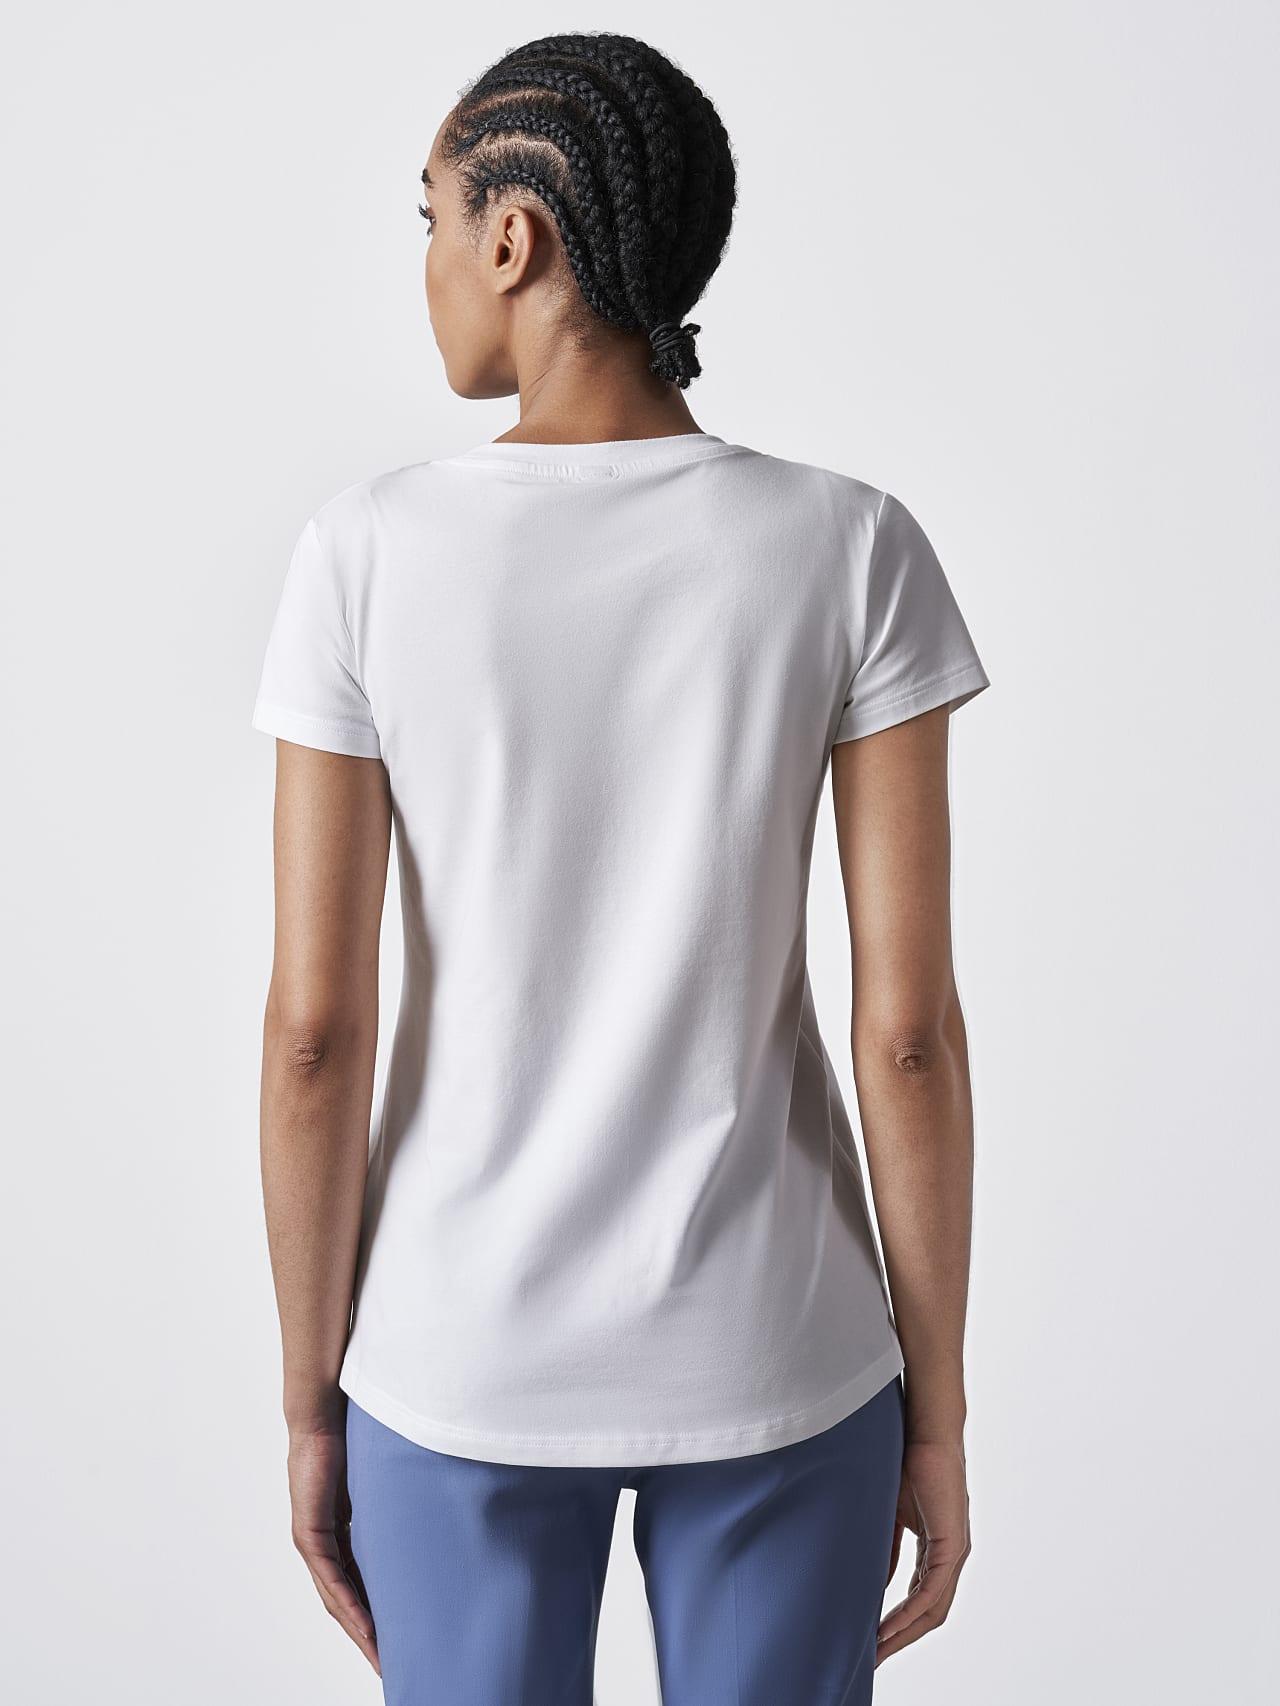 JERU V2.Y4.02 Signature Logo T-Shirt white Front Main Alpha Tauri